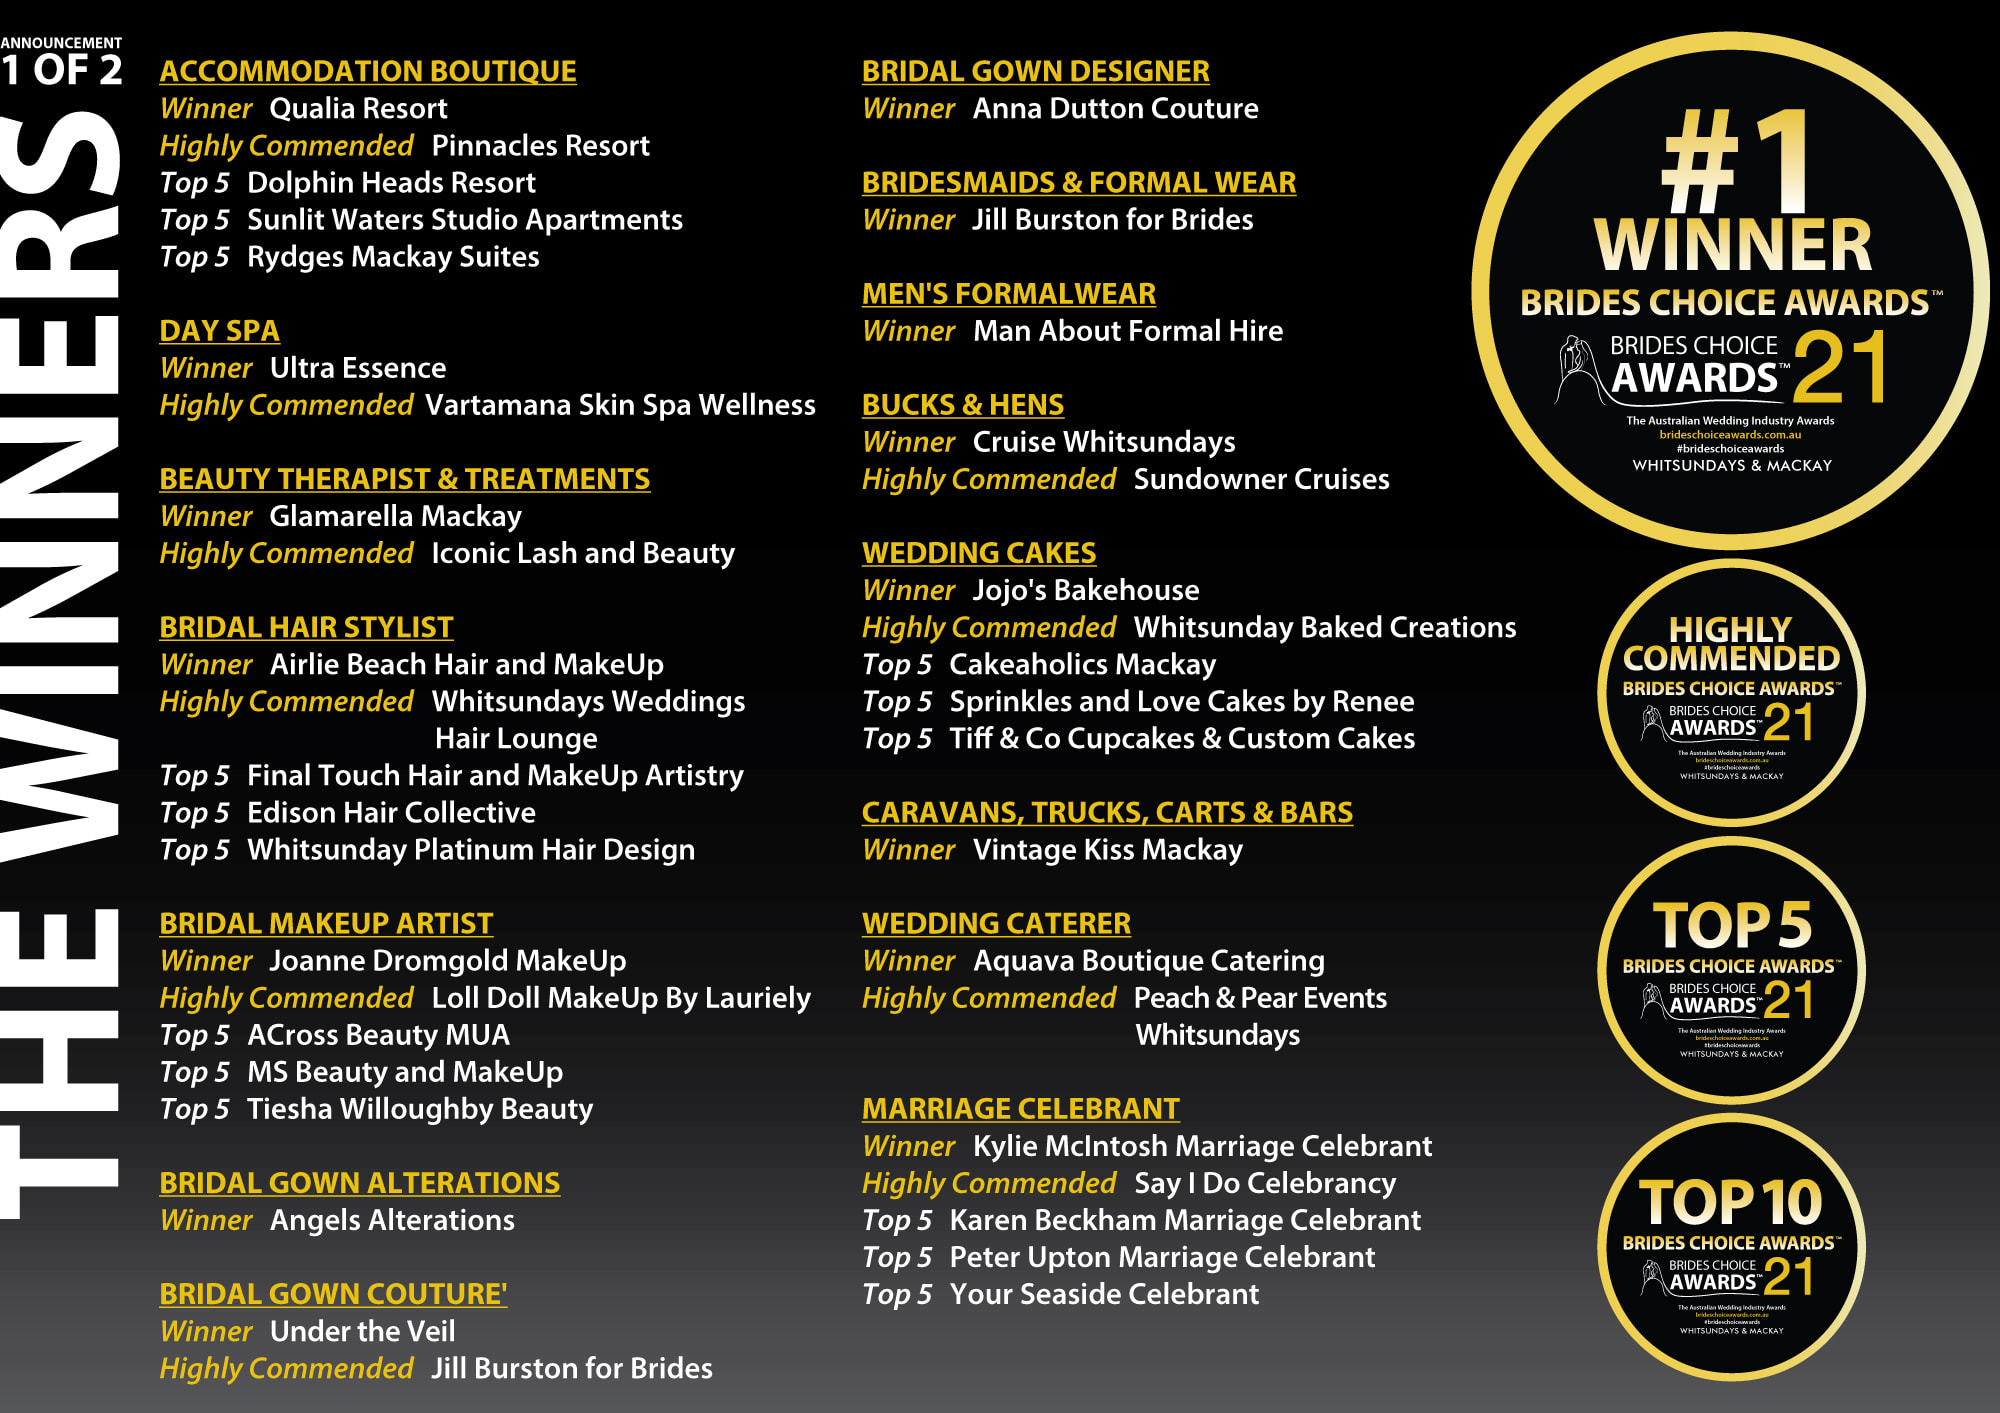 WINNERS from Whitsundays & Mackay 2021 Brides Choice Awards 2021